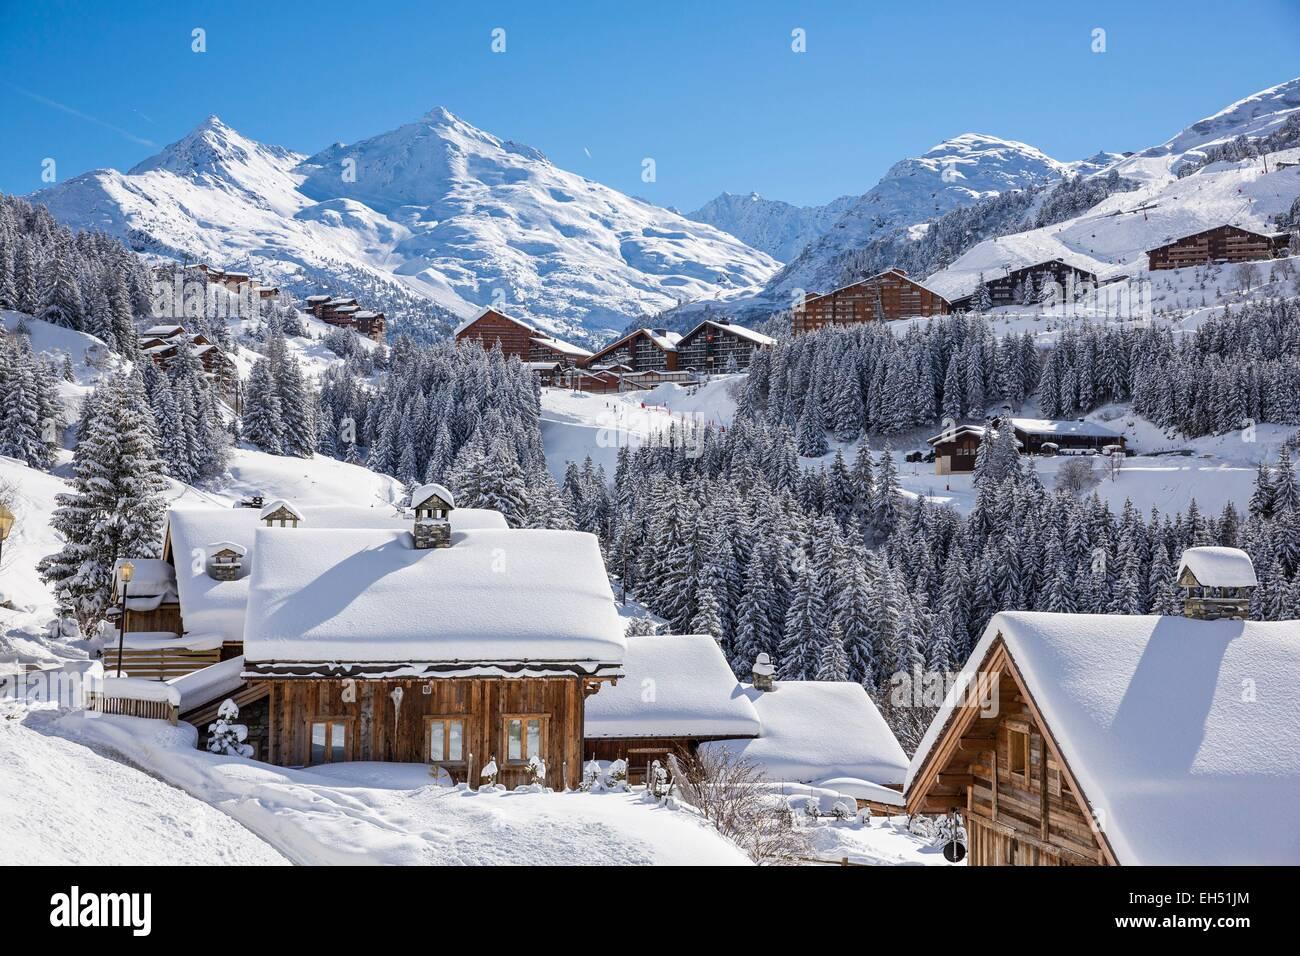 france, savoie, tarentaise valley, hamlet of la rosiere, meribel